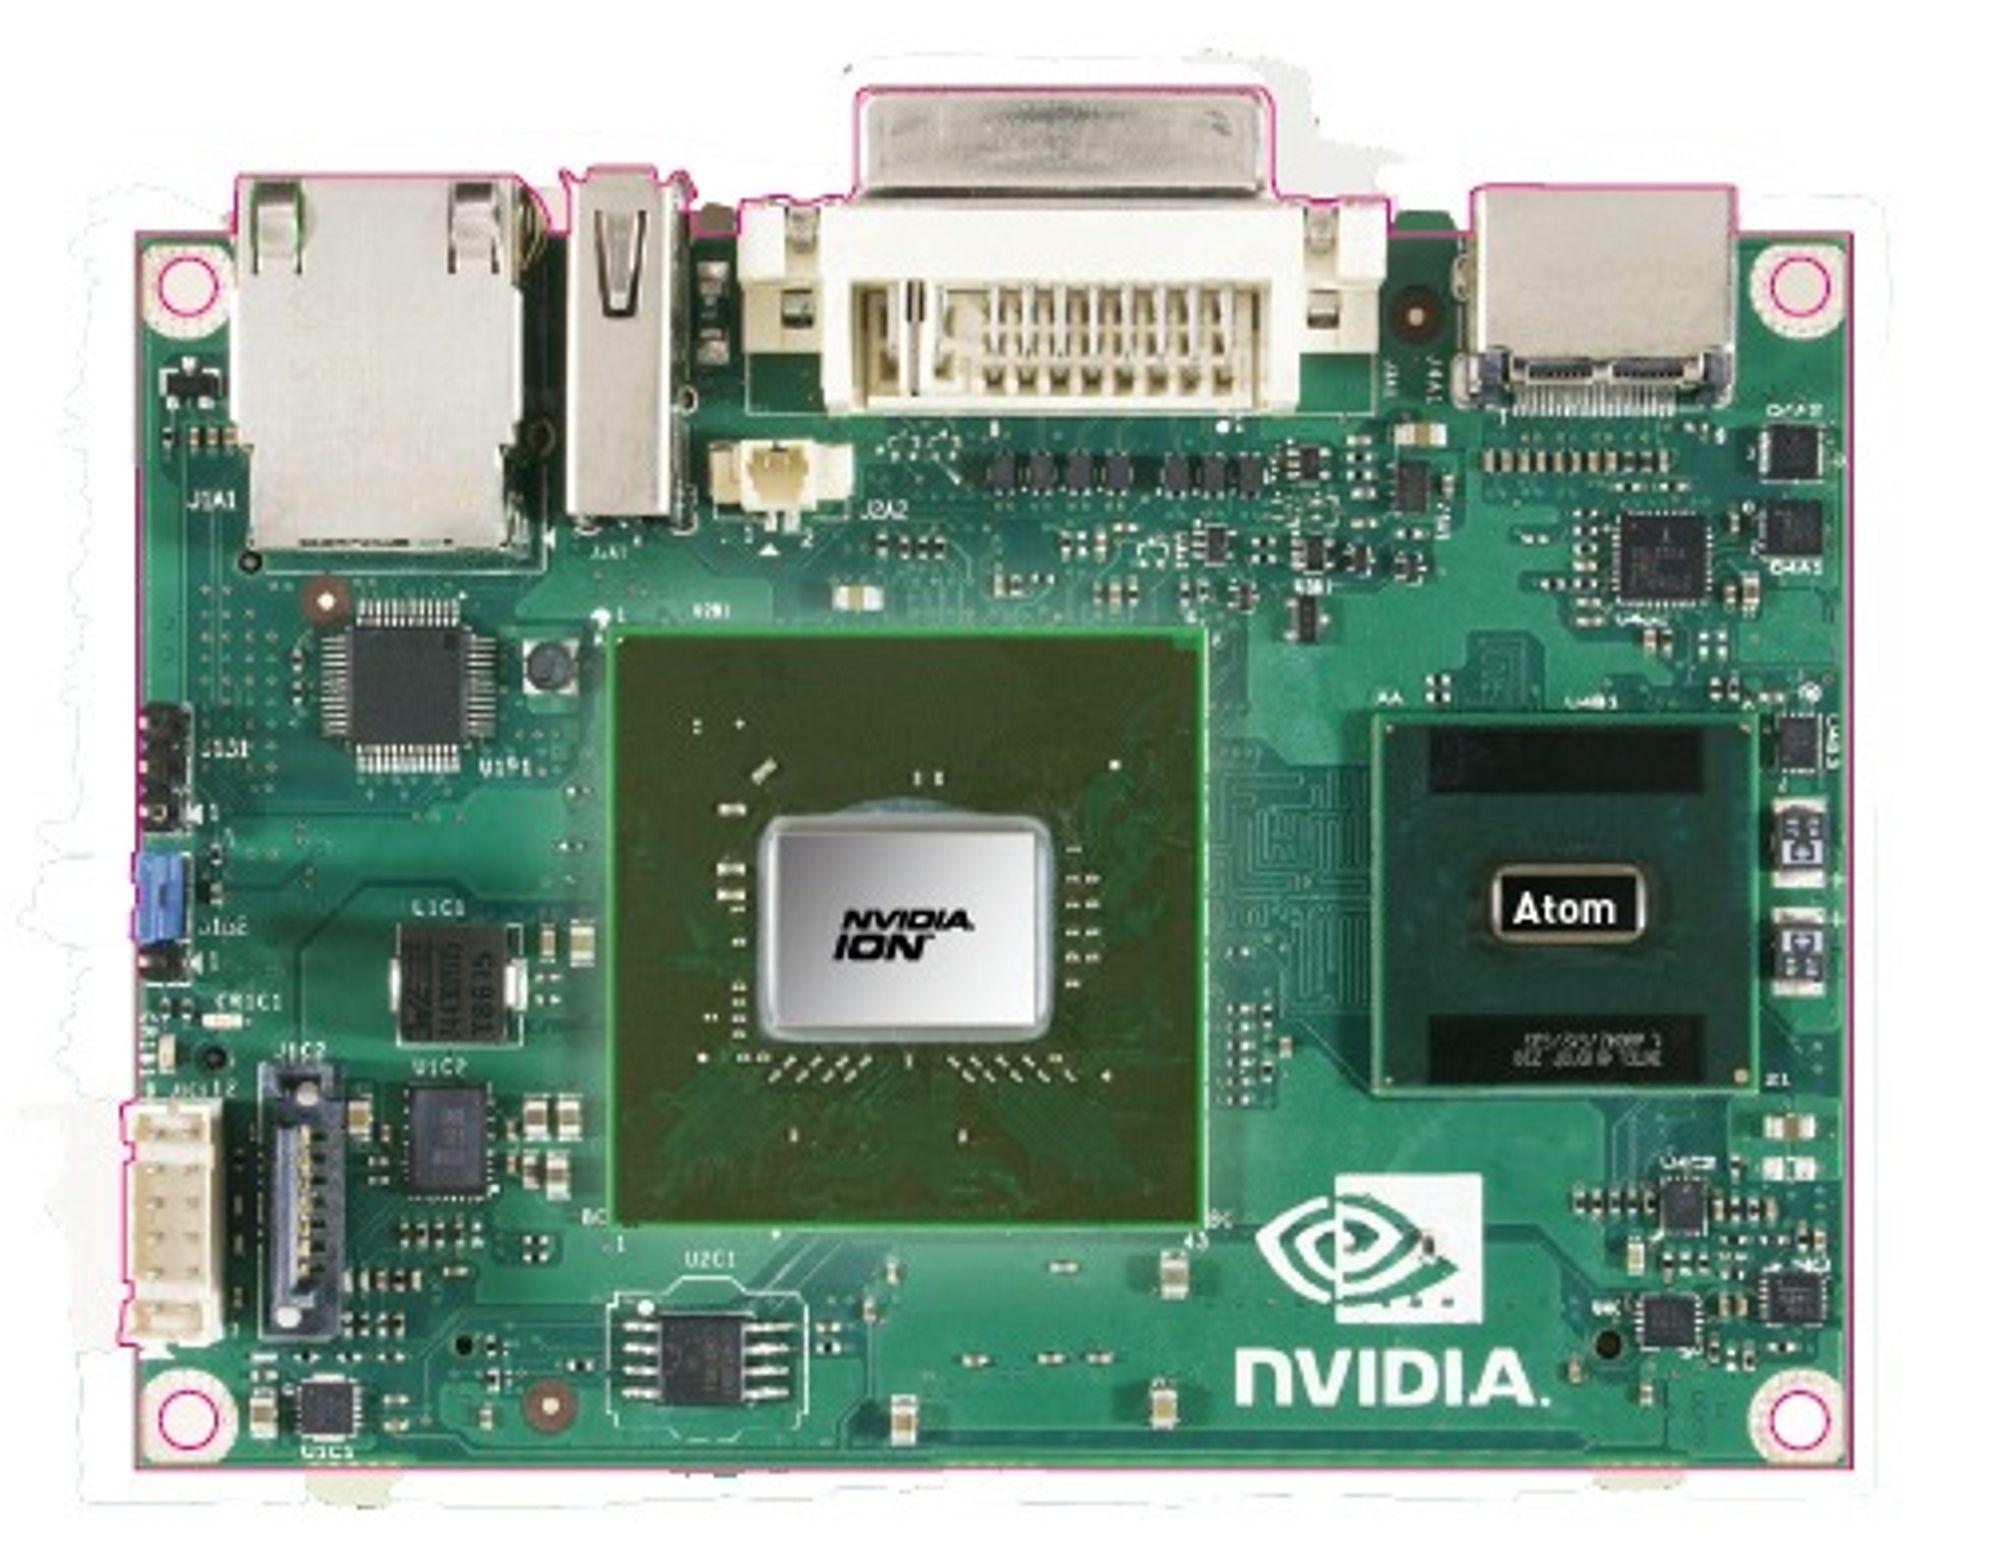 Nvidia Ion-basert hovedkort